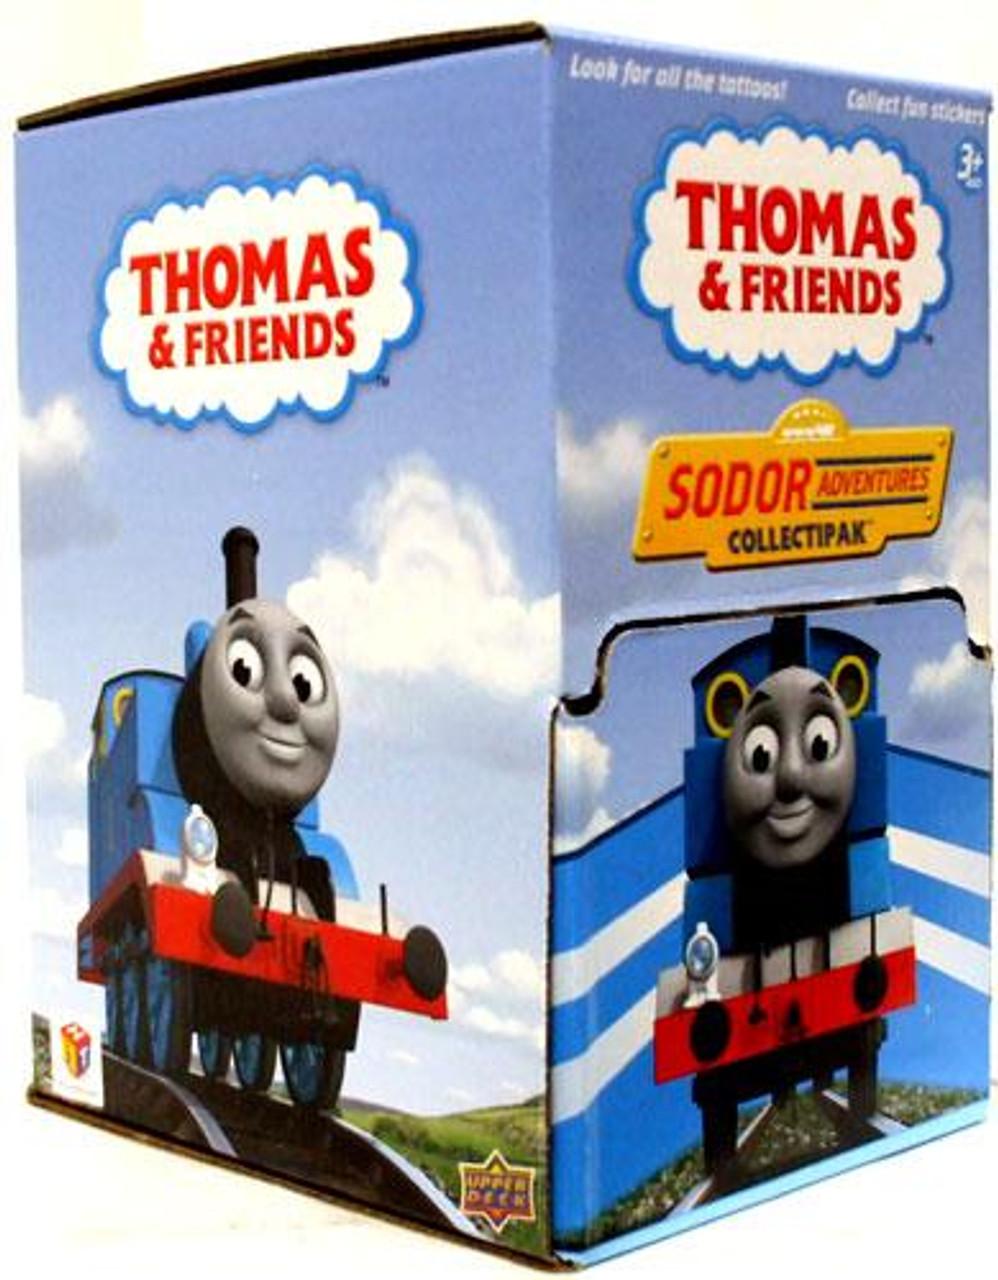 Thomas & Friends Sodor Adventures Collectipak Trading Card Box